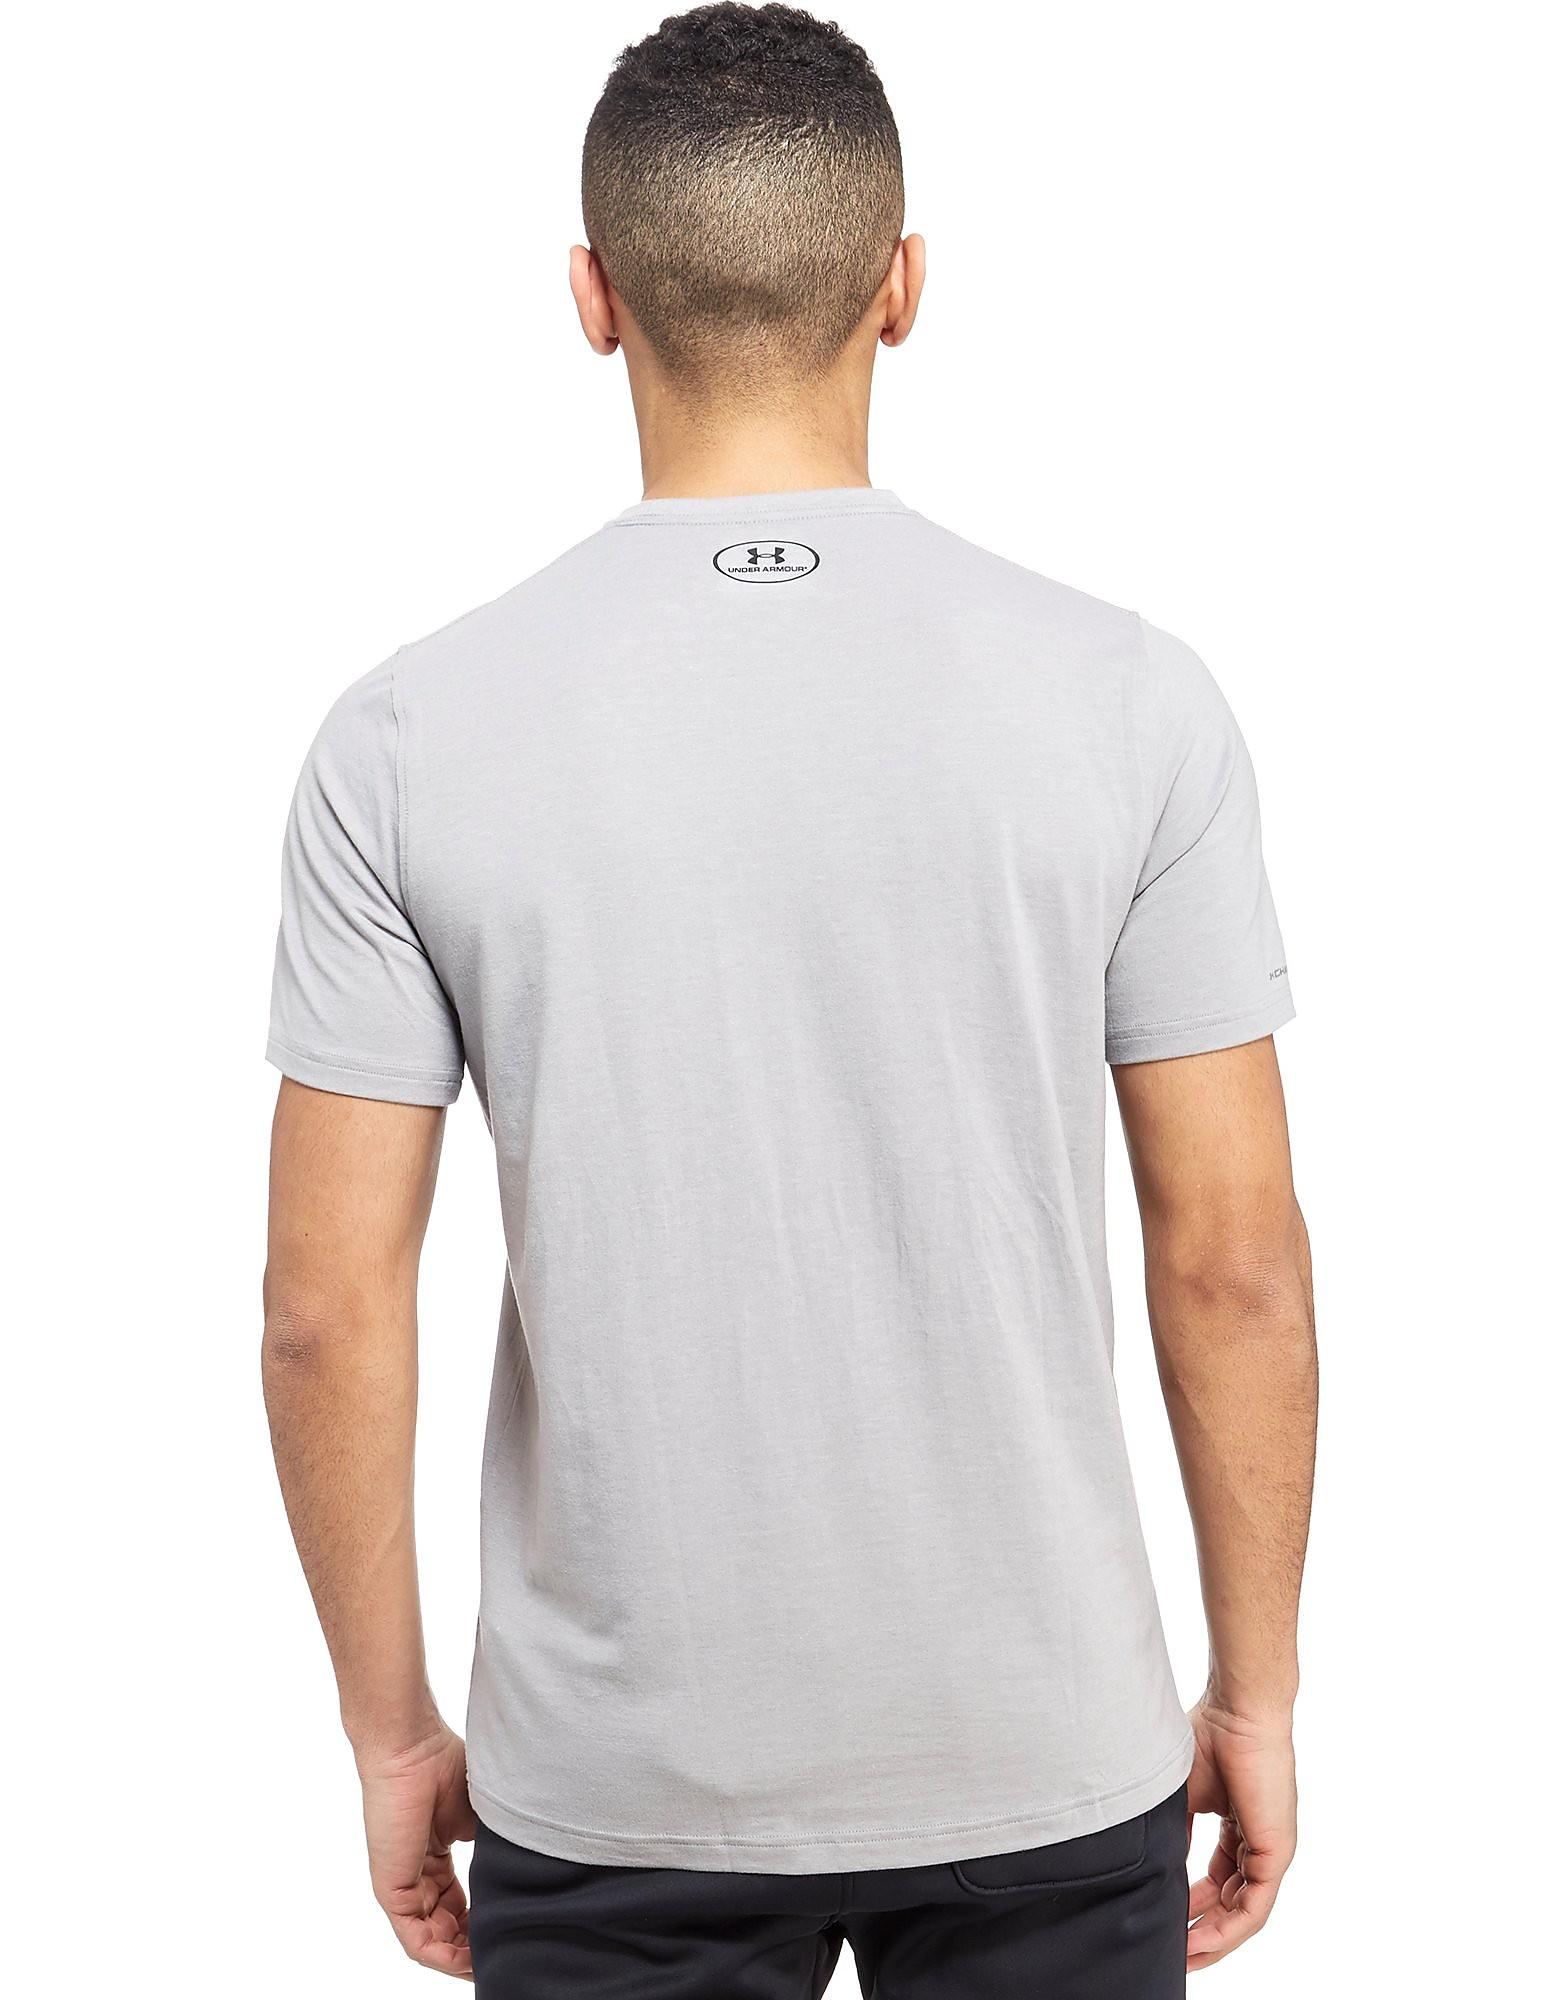 Under Armour T-shirt Sport Logo Homme